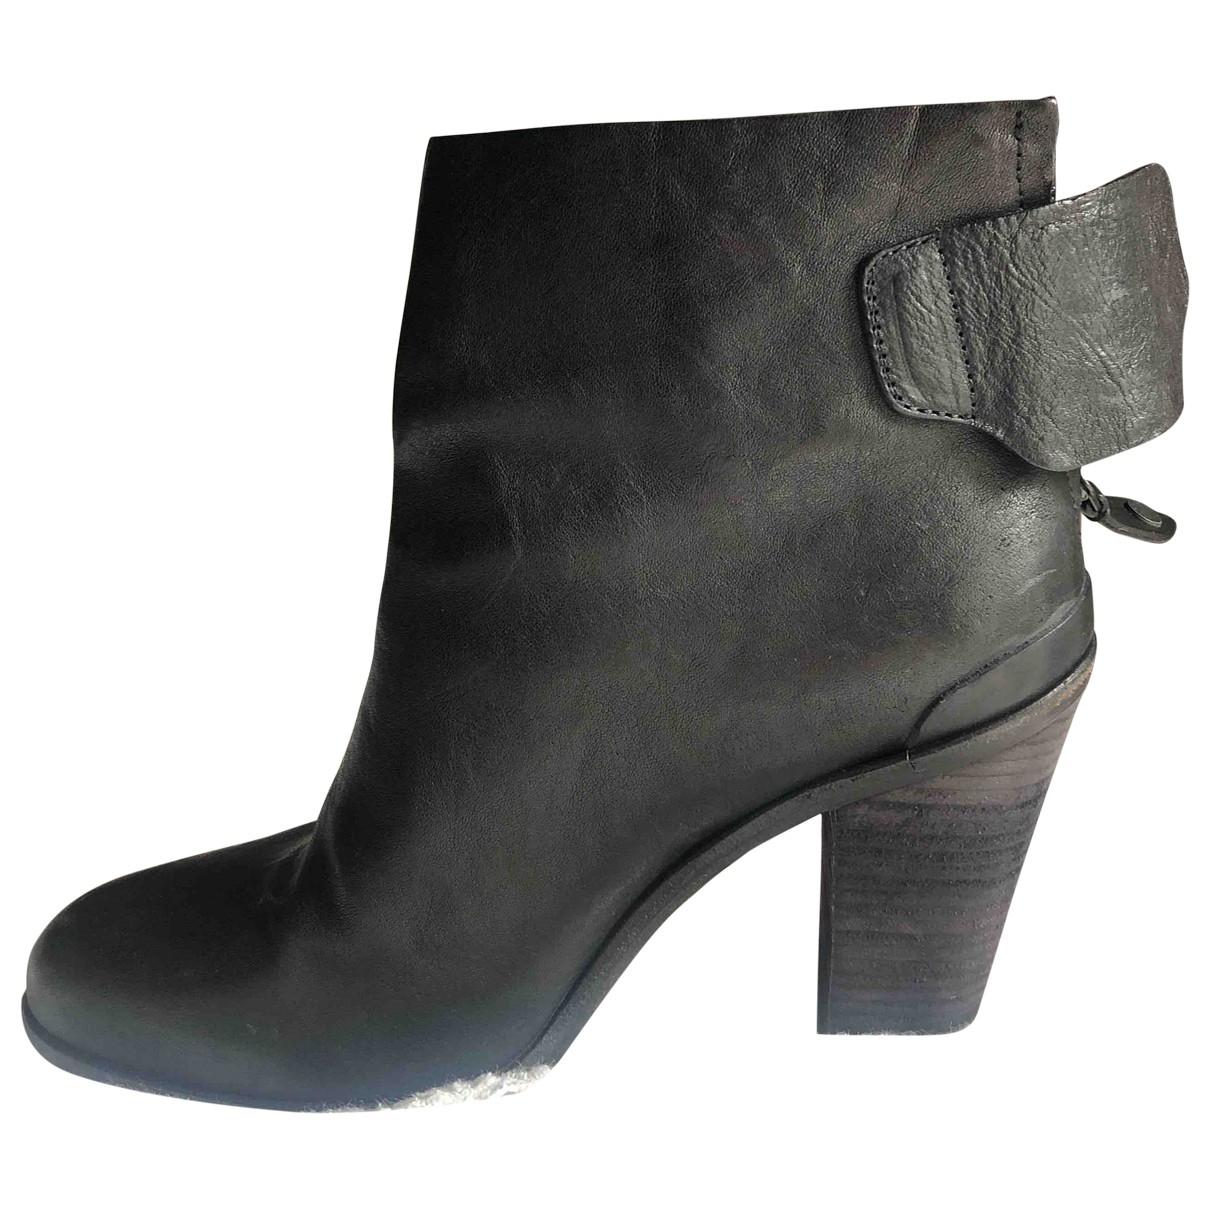 Rag & Bone \N Black Leather Ankle boots for Women 41 EU